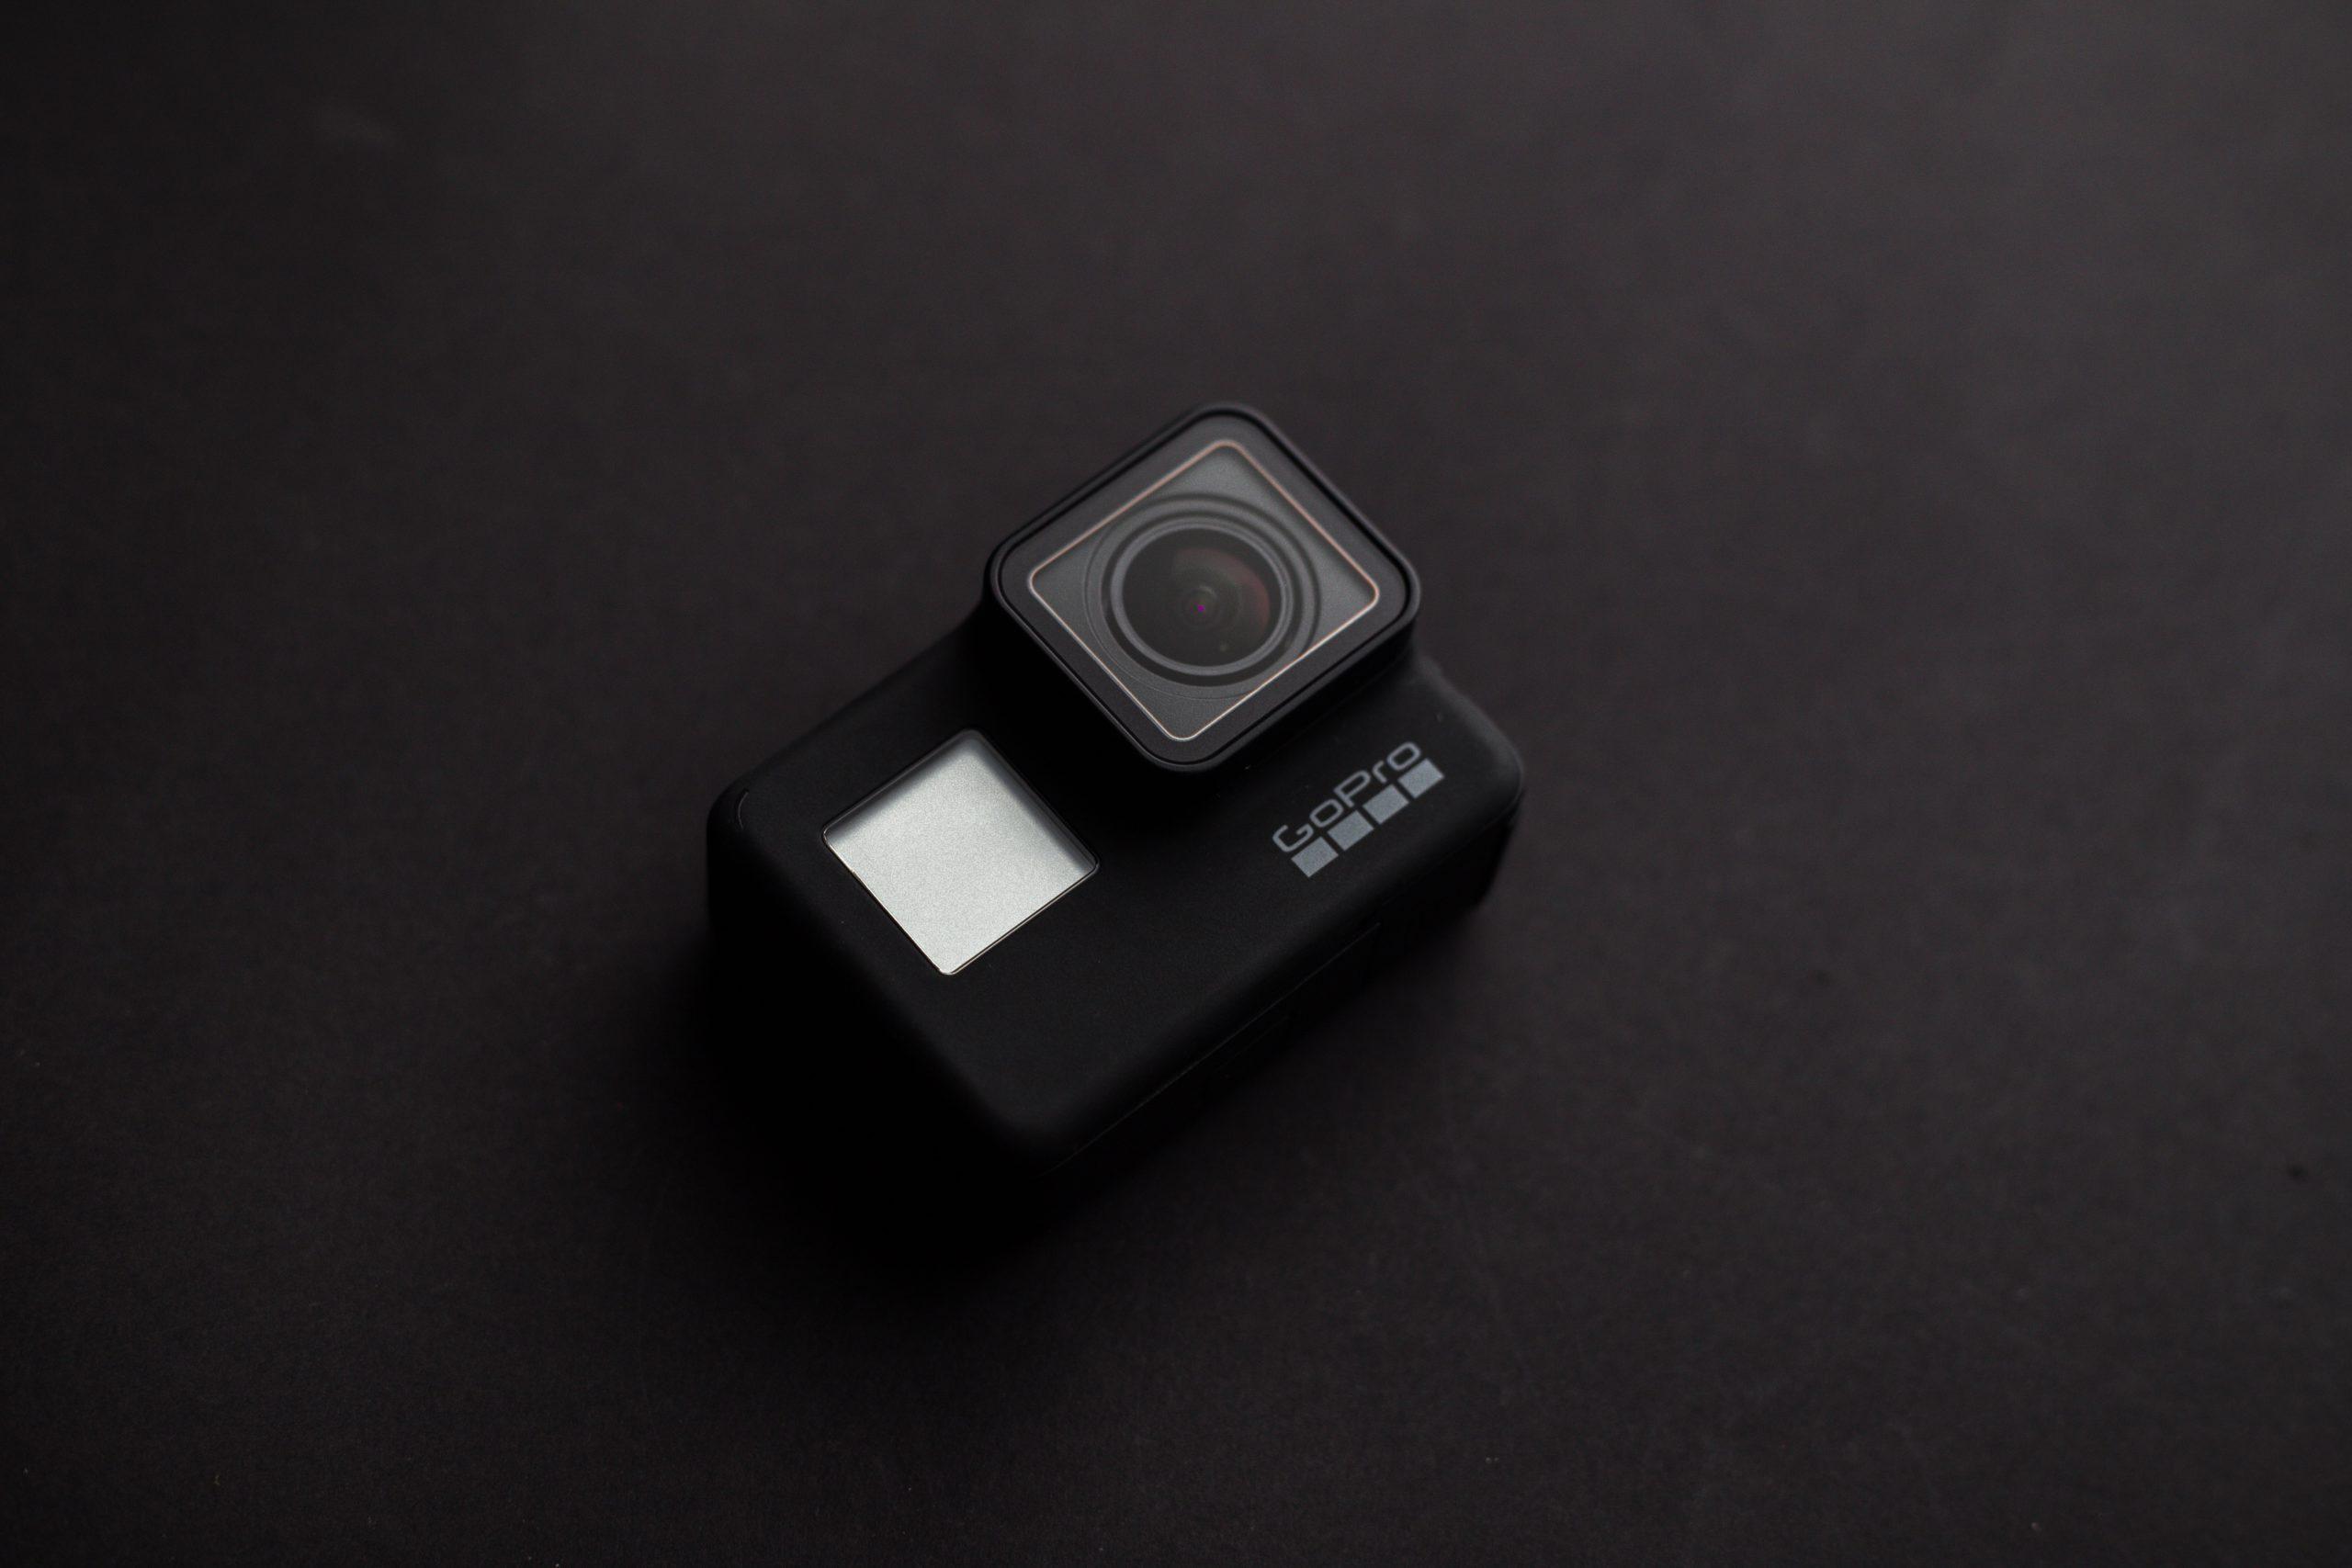 How to setup GoPro